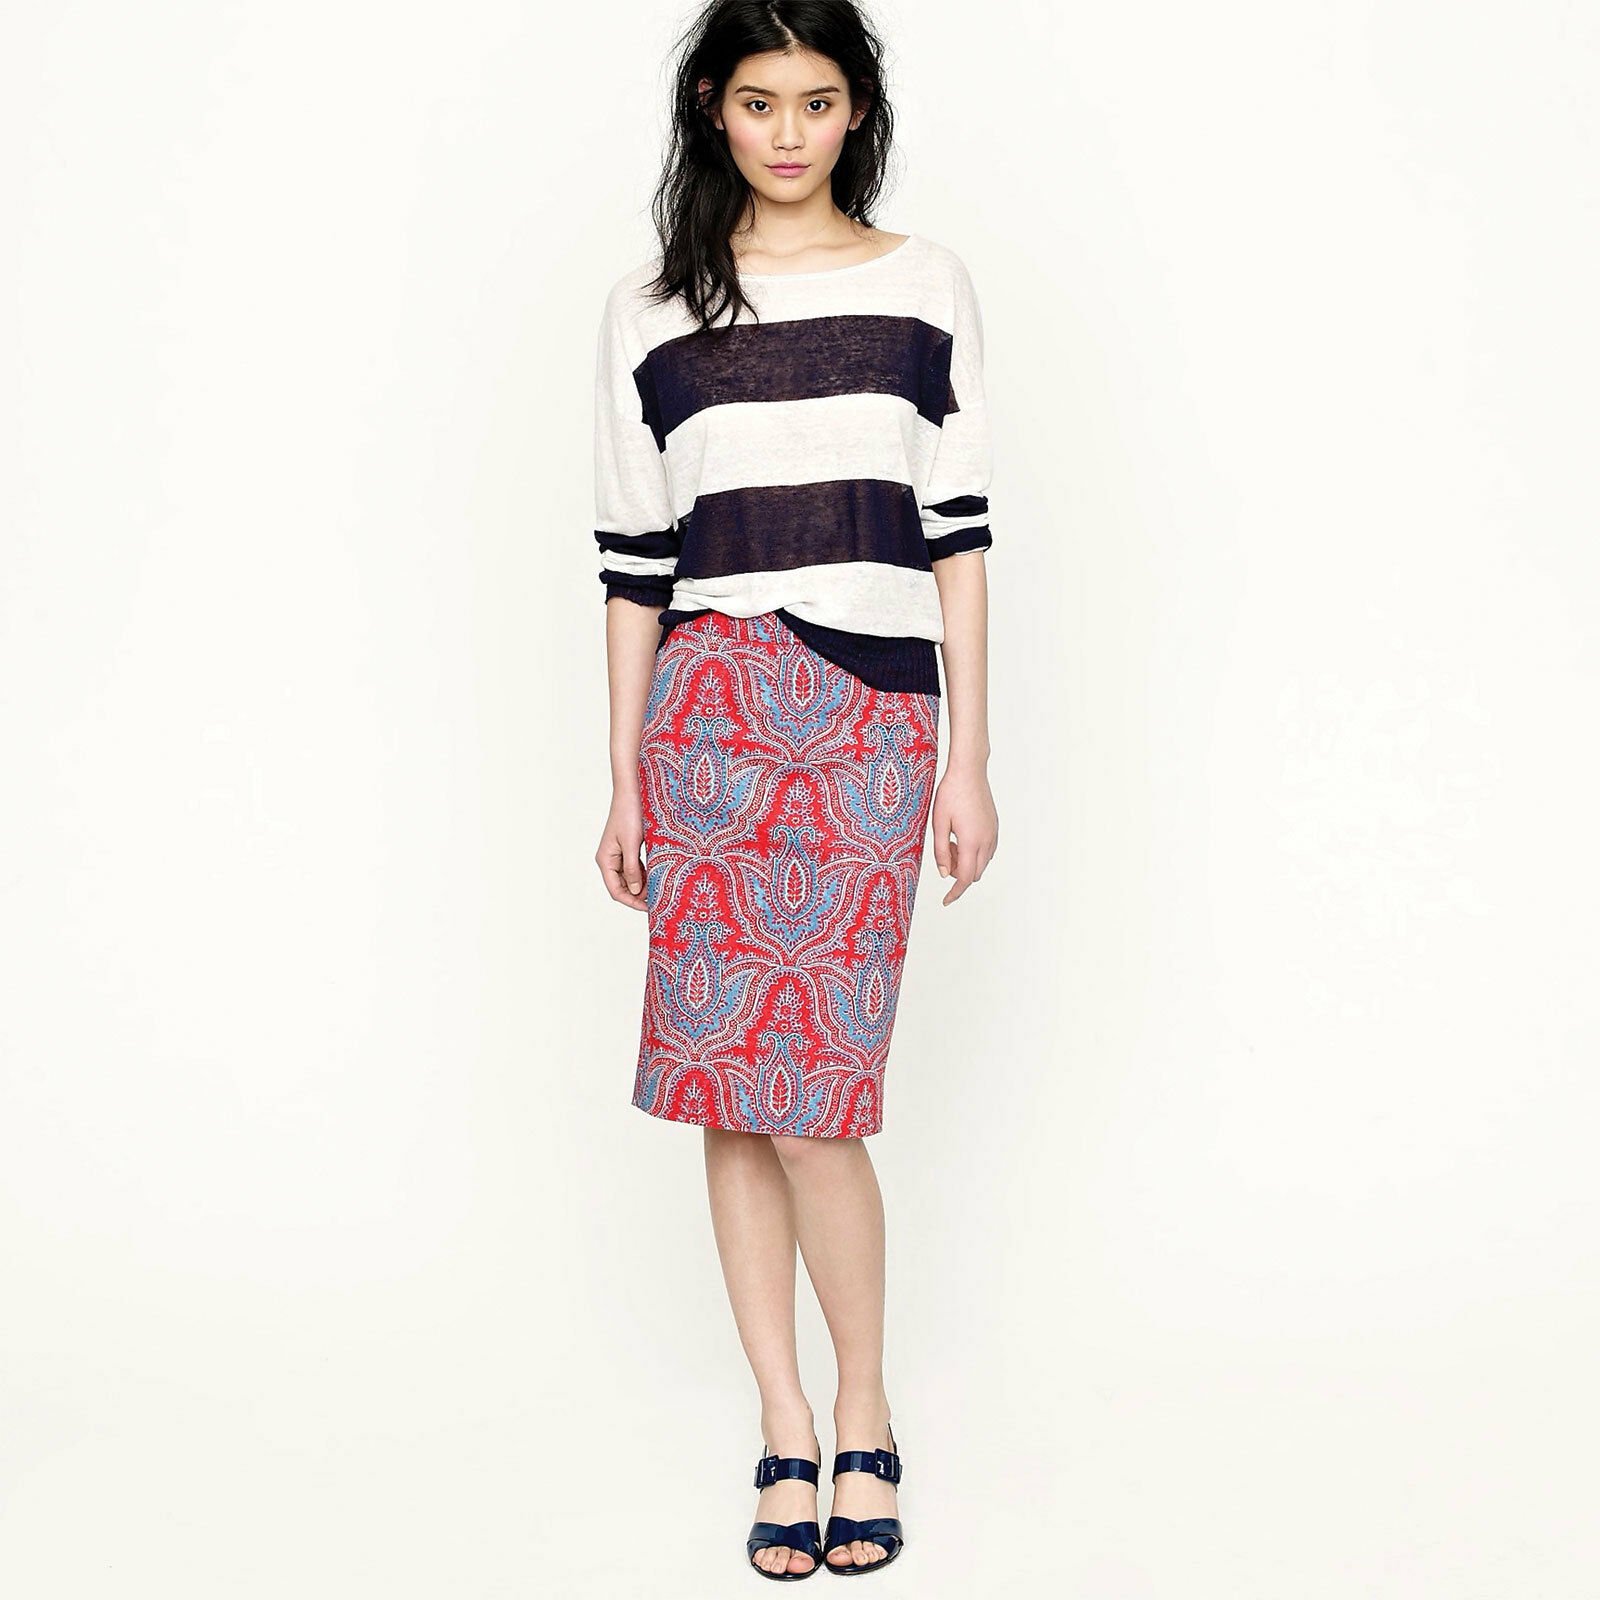 J Crew No 2 Pencil Skirt in Raj Paisley Cotton  138 Sz 00 Style 78860